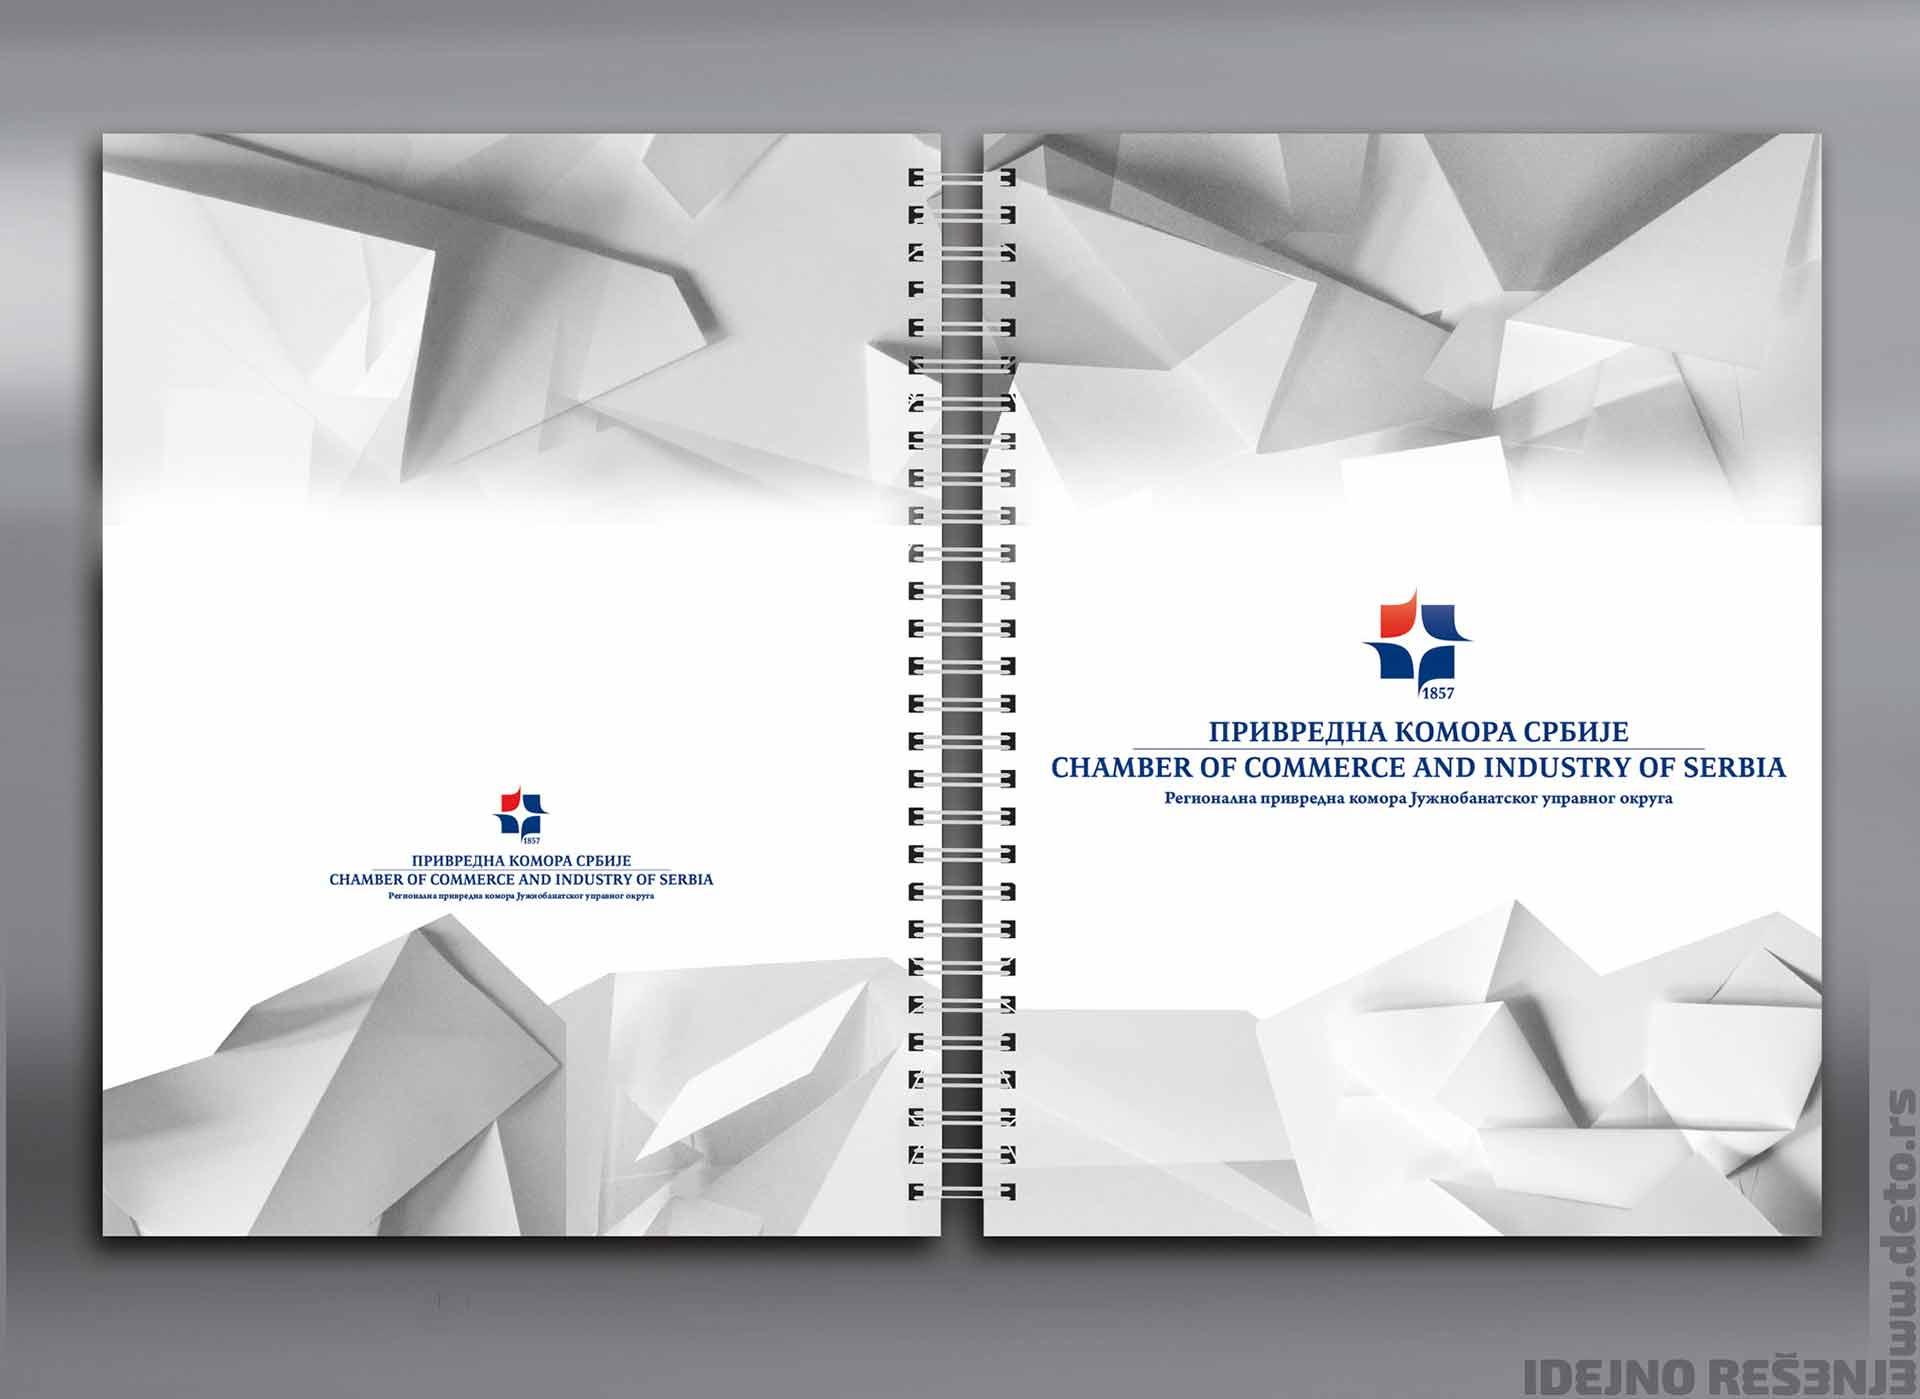 Dizajn - idejno rešenje korica za reklamni blok A5 (sa originalnim fotografijama) / Privredna komora Srbije